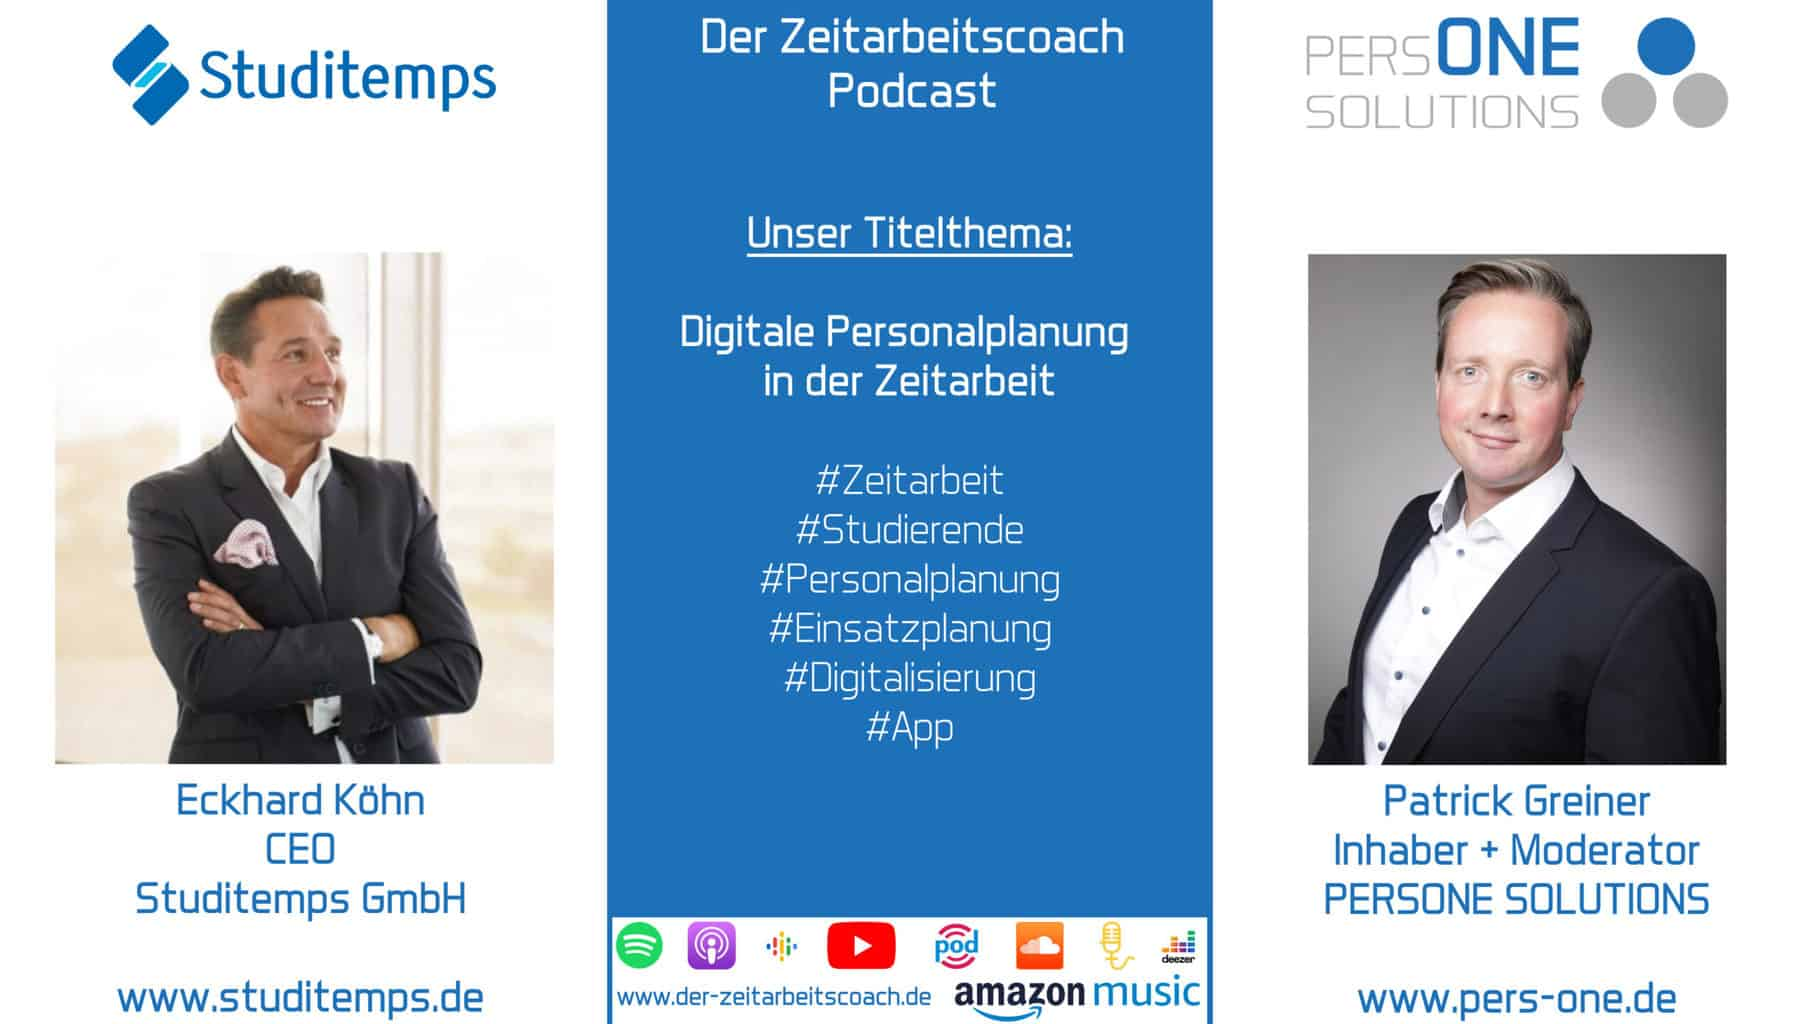 Köhn, Eckhard-Studitemps_Podcast YT-SM Grafik_Zeitarbeitscoach Podcast